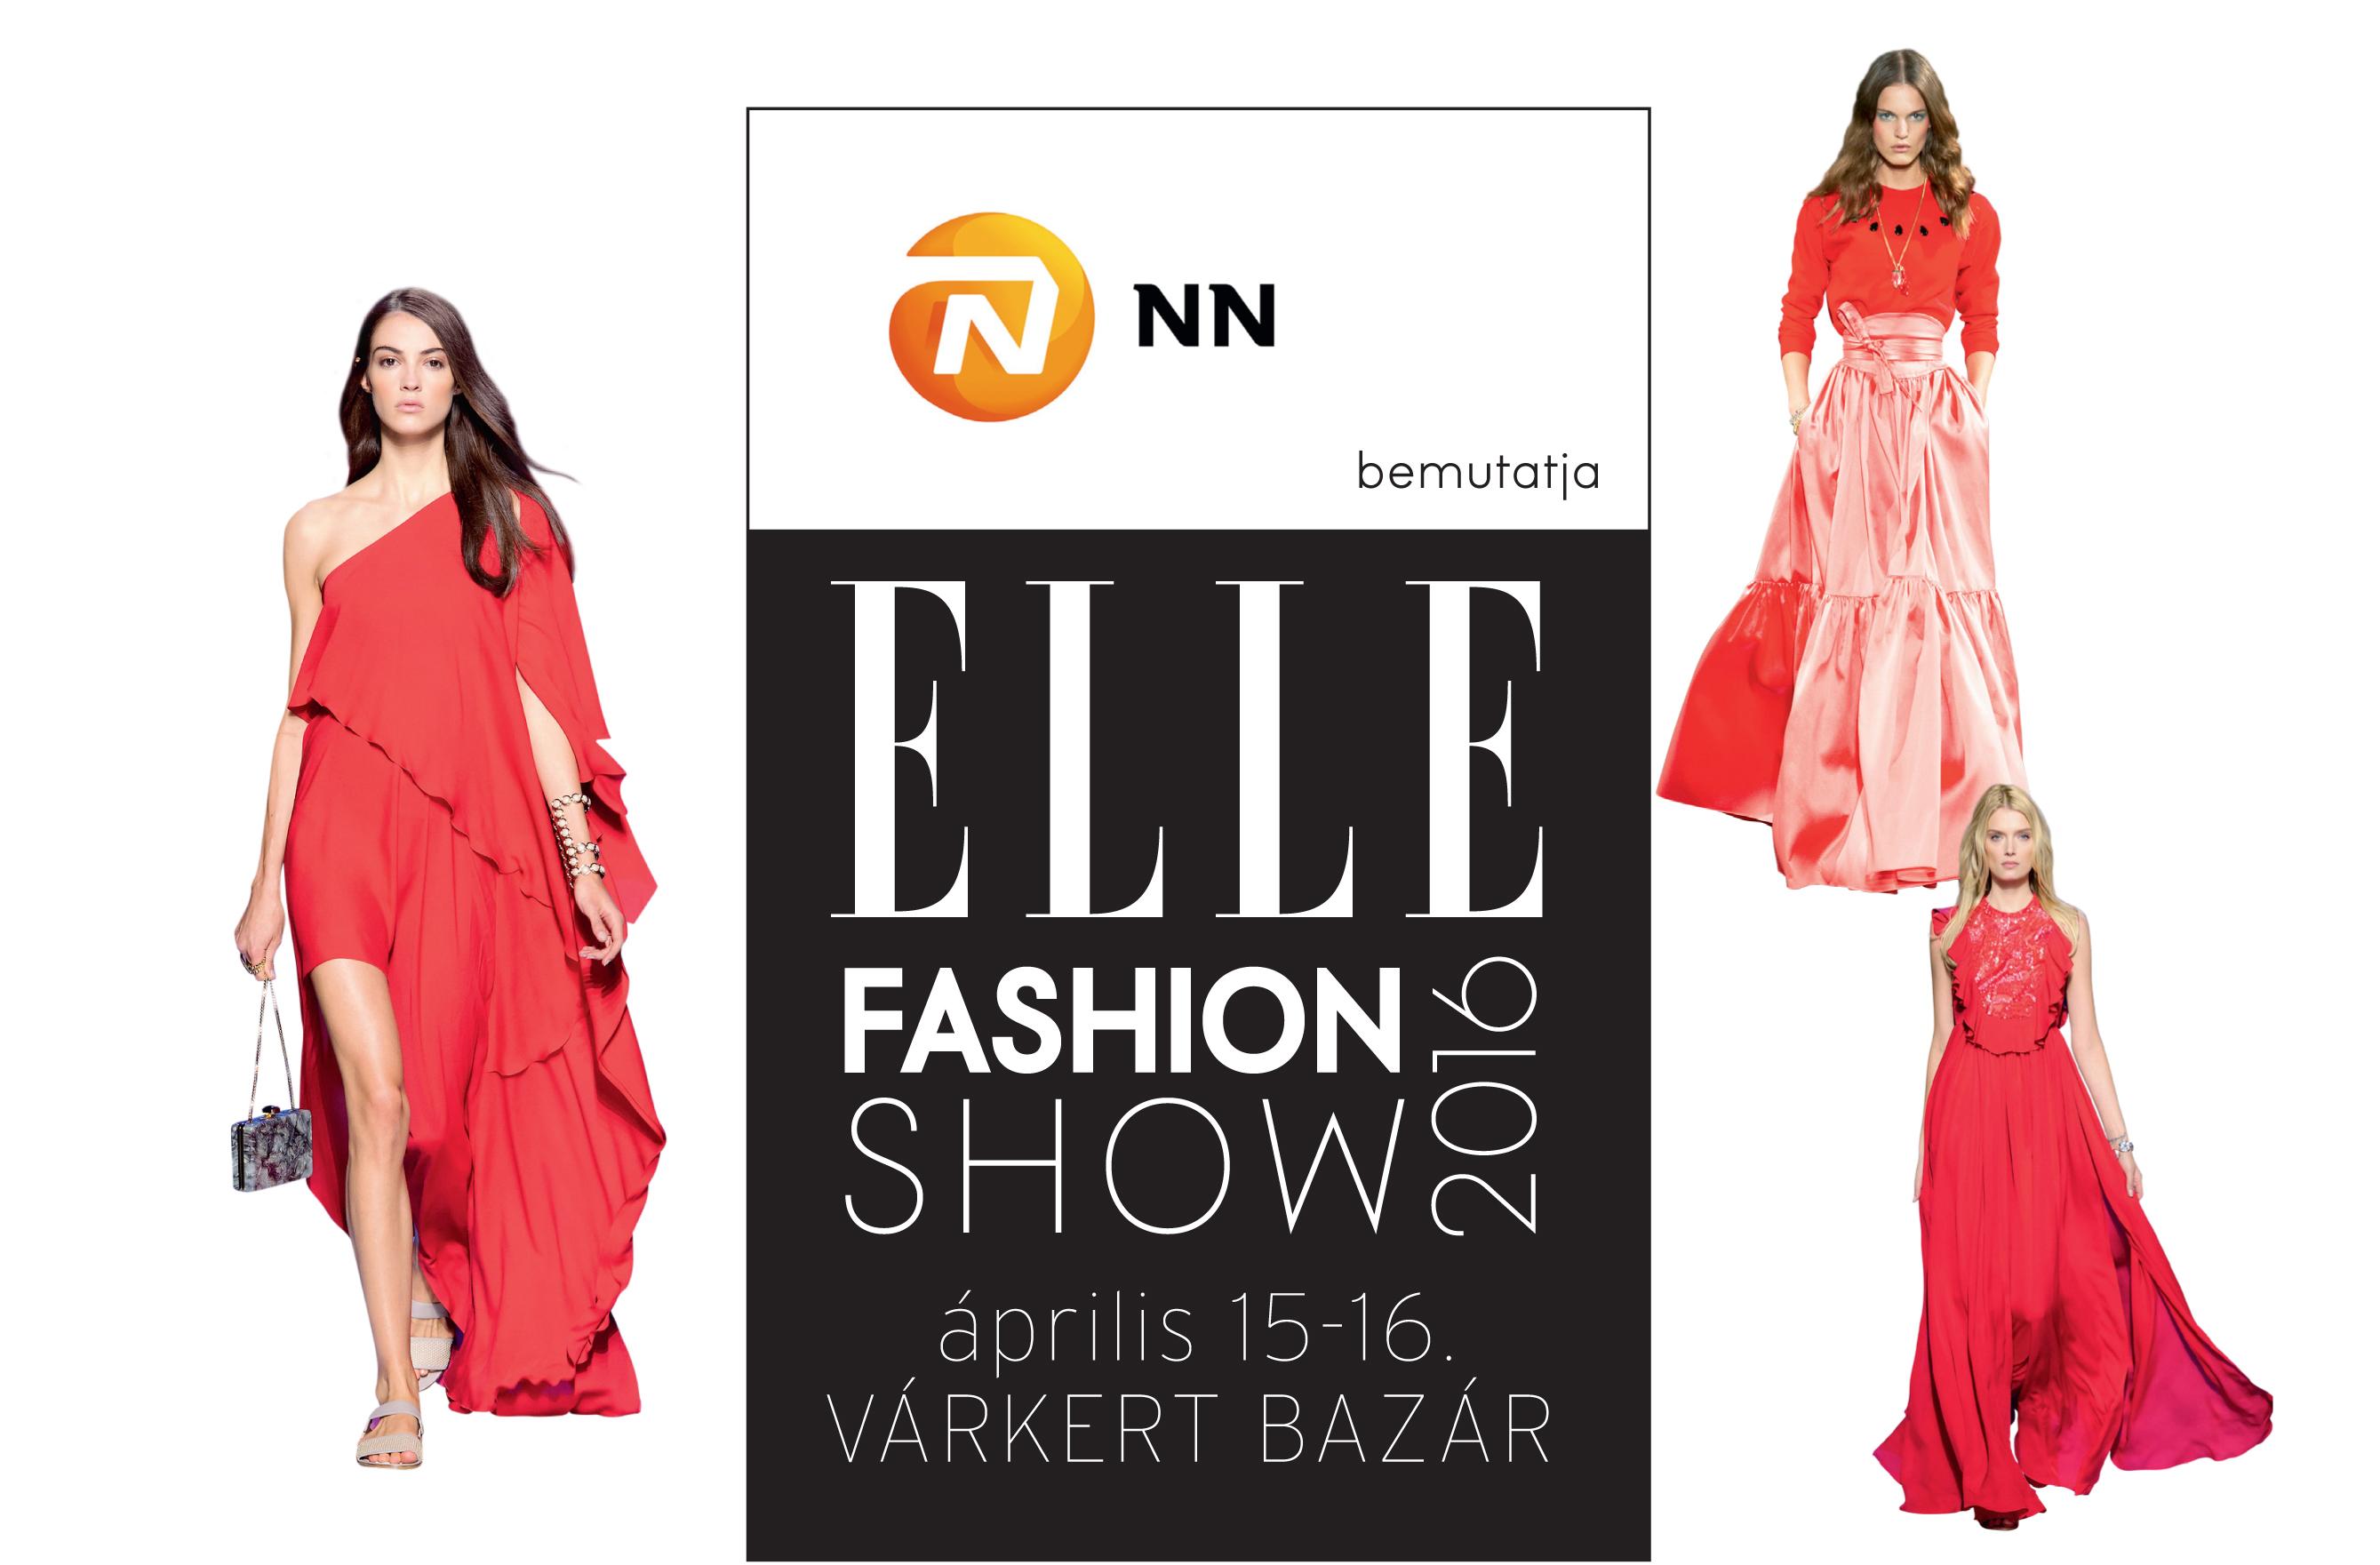 elle-fashion-show-2016-napijegy-pentek-original-76497.jpg